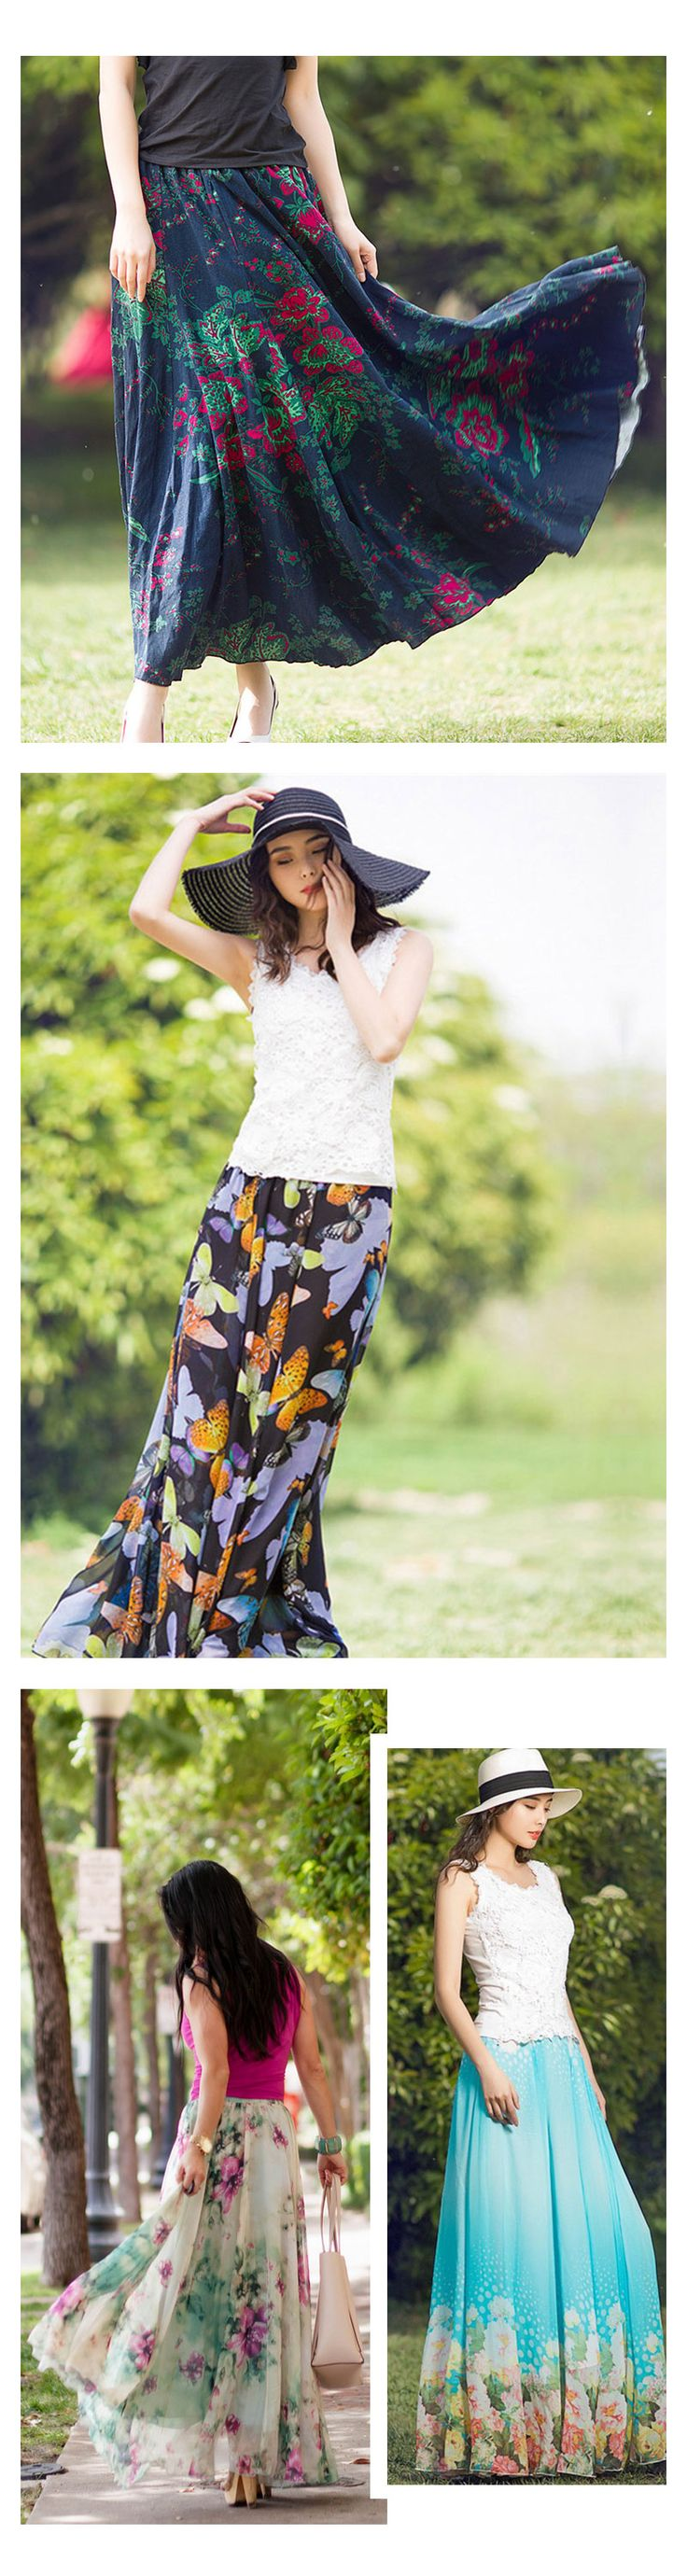 Women's Long Skirt, Slim & Stylish Styles